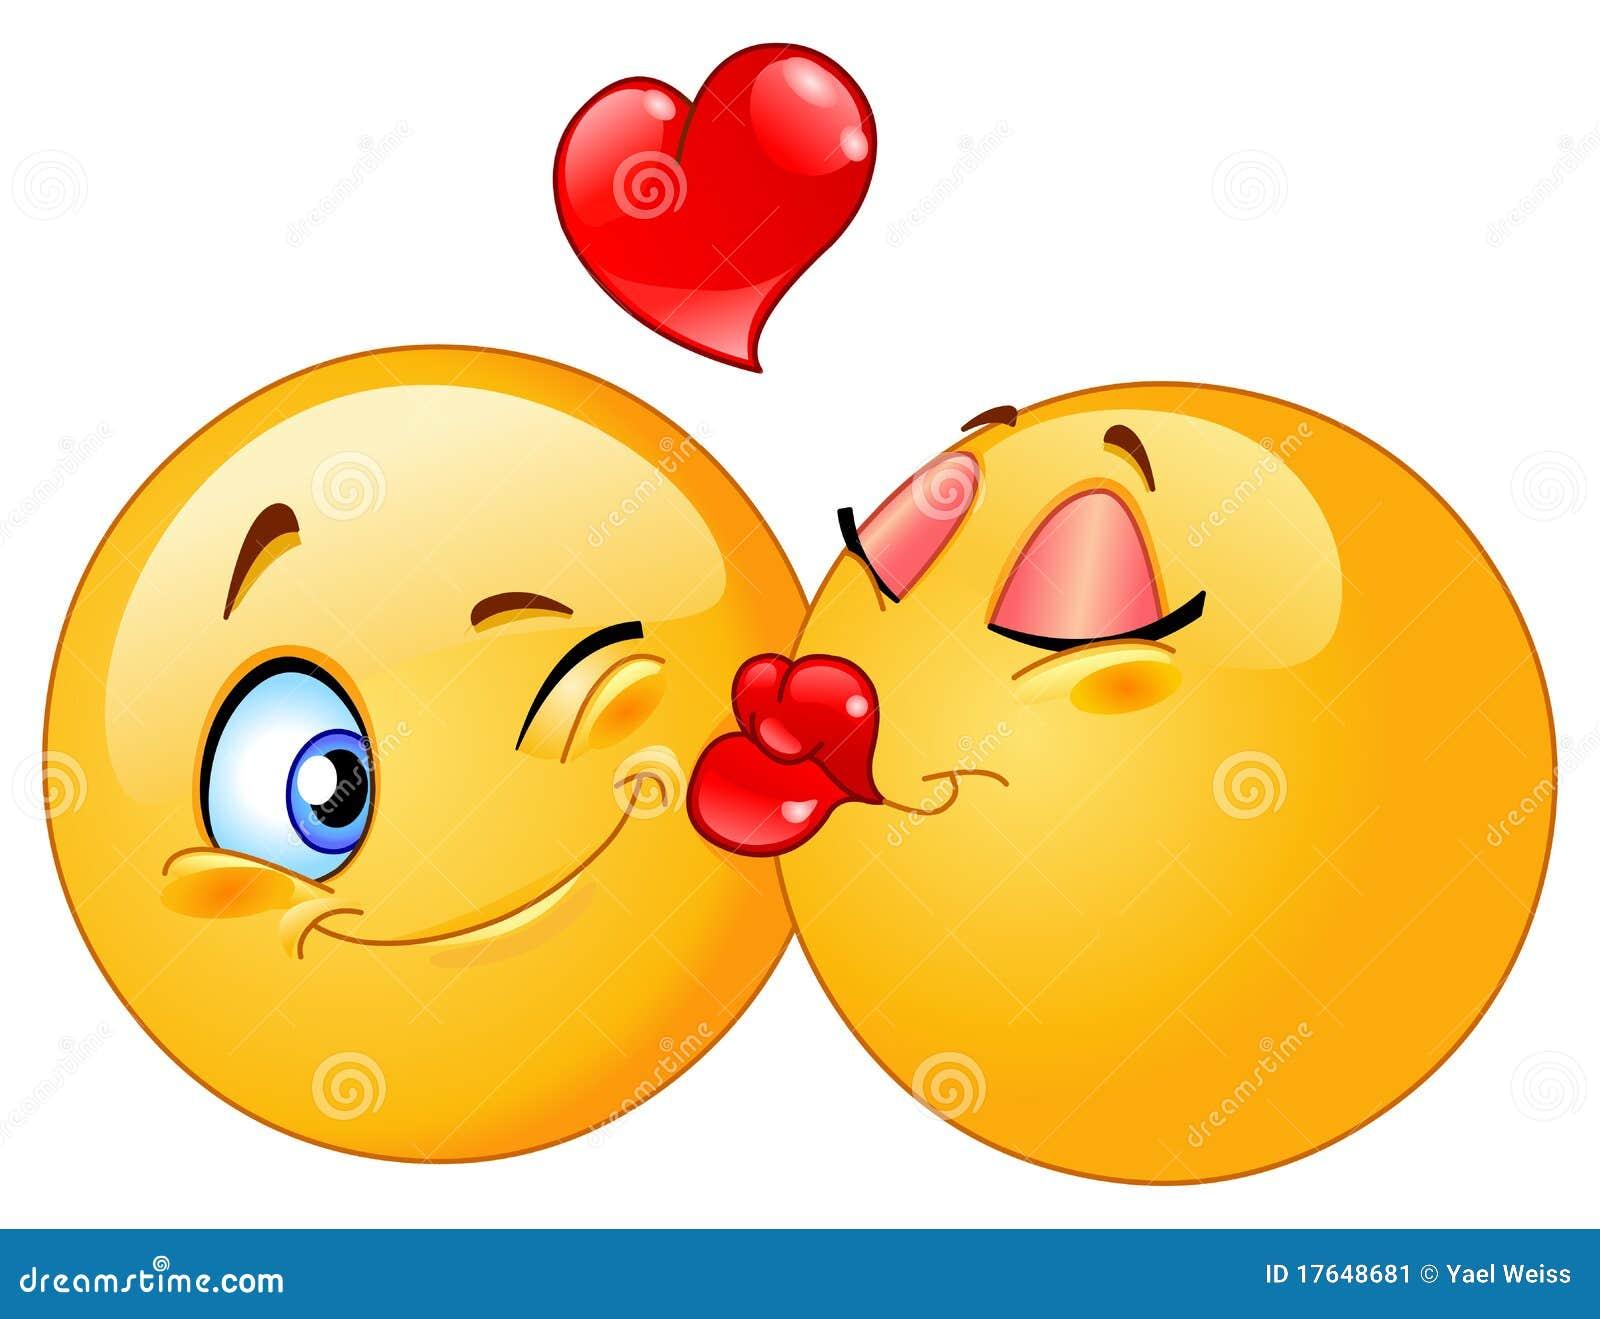 emoticons de beijos para msn